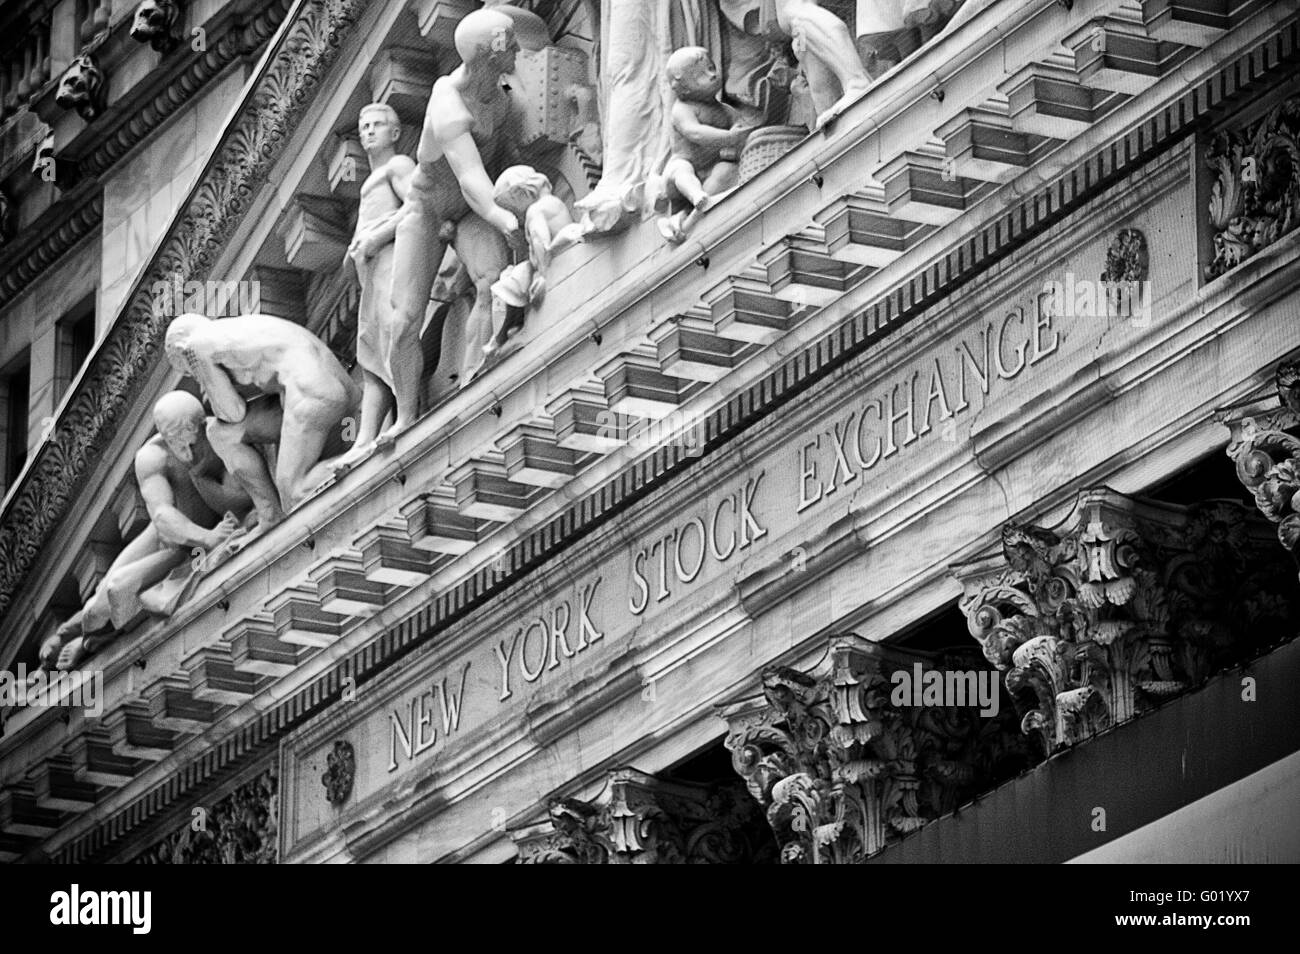 Stock Exchange - Stock Image